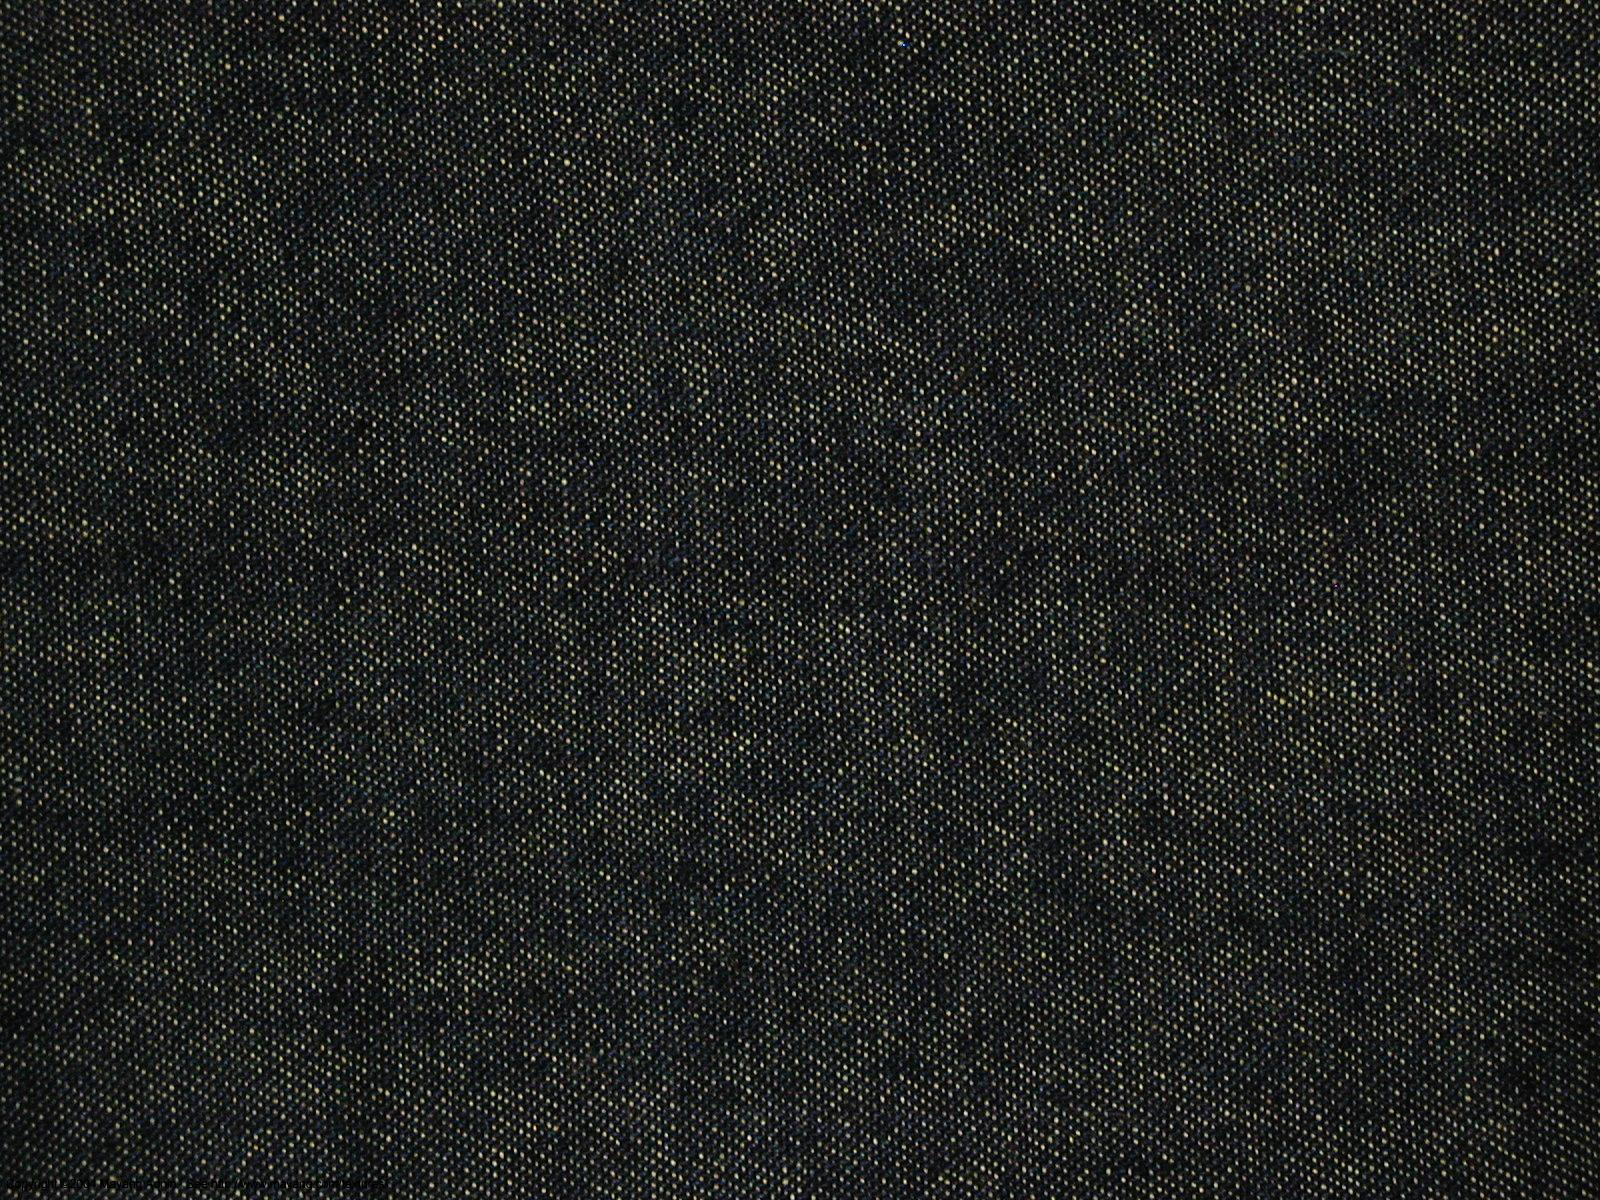 Black Denim Texture